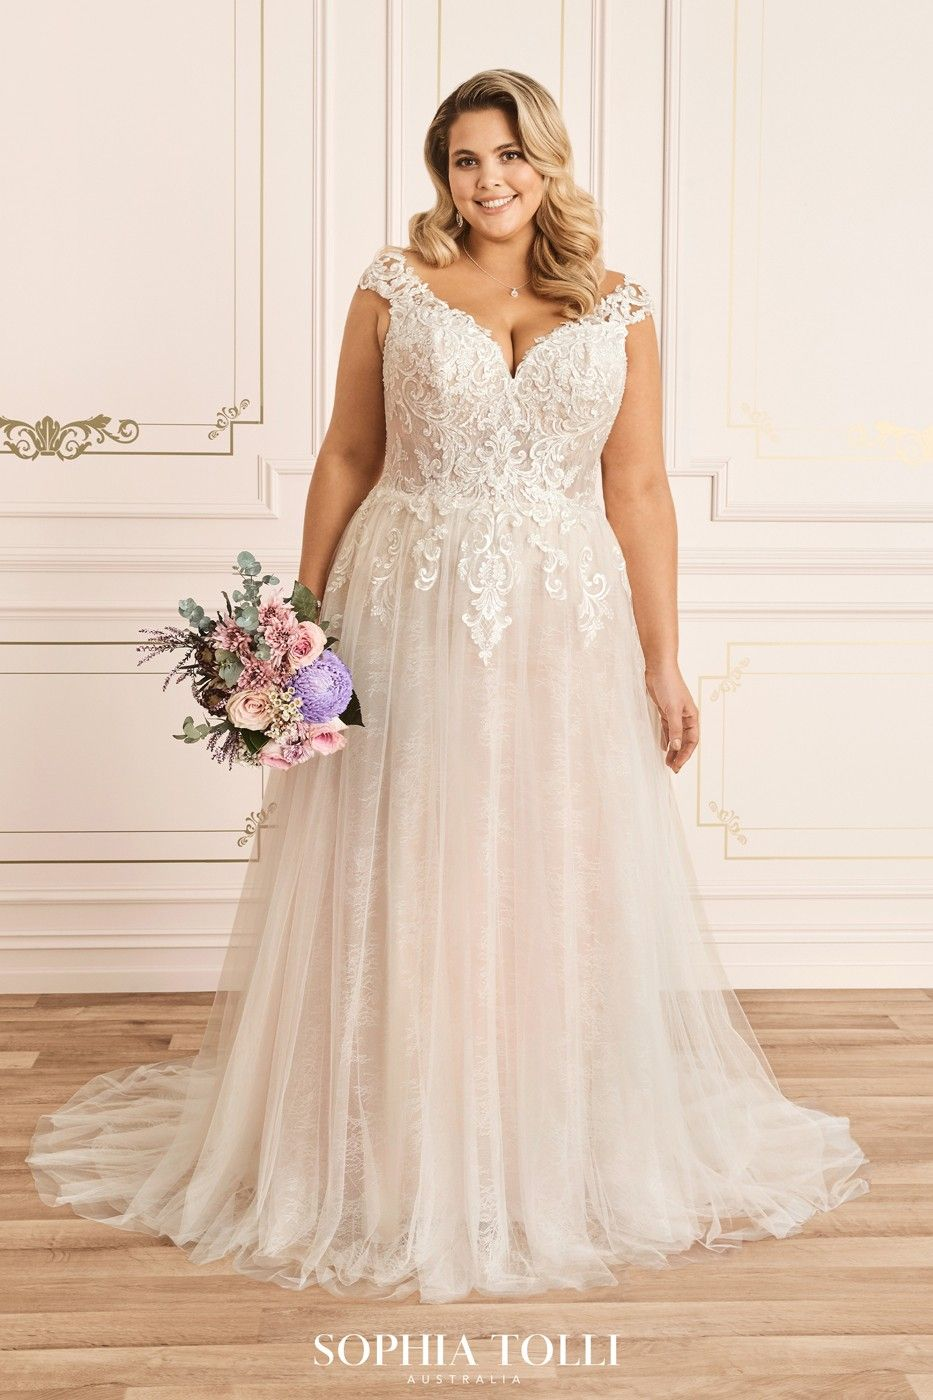 Sophia Tolli Y12023ls Kaydence Cap Sleeve Plus Size Wedding Gown Plus Size Wedding Gowns Plus Wedding Dresses Plus Size Bridal Dresses [ 1400 x 933 Pixel ]